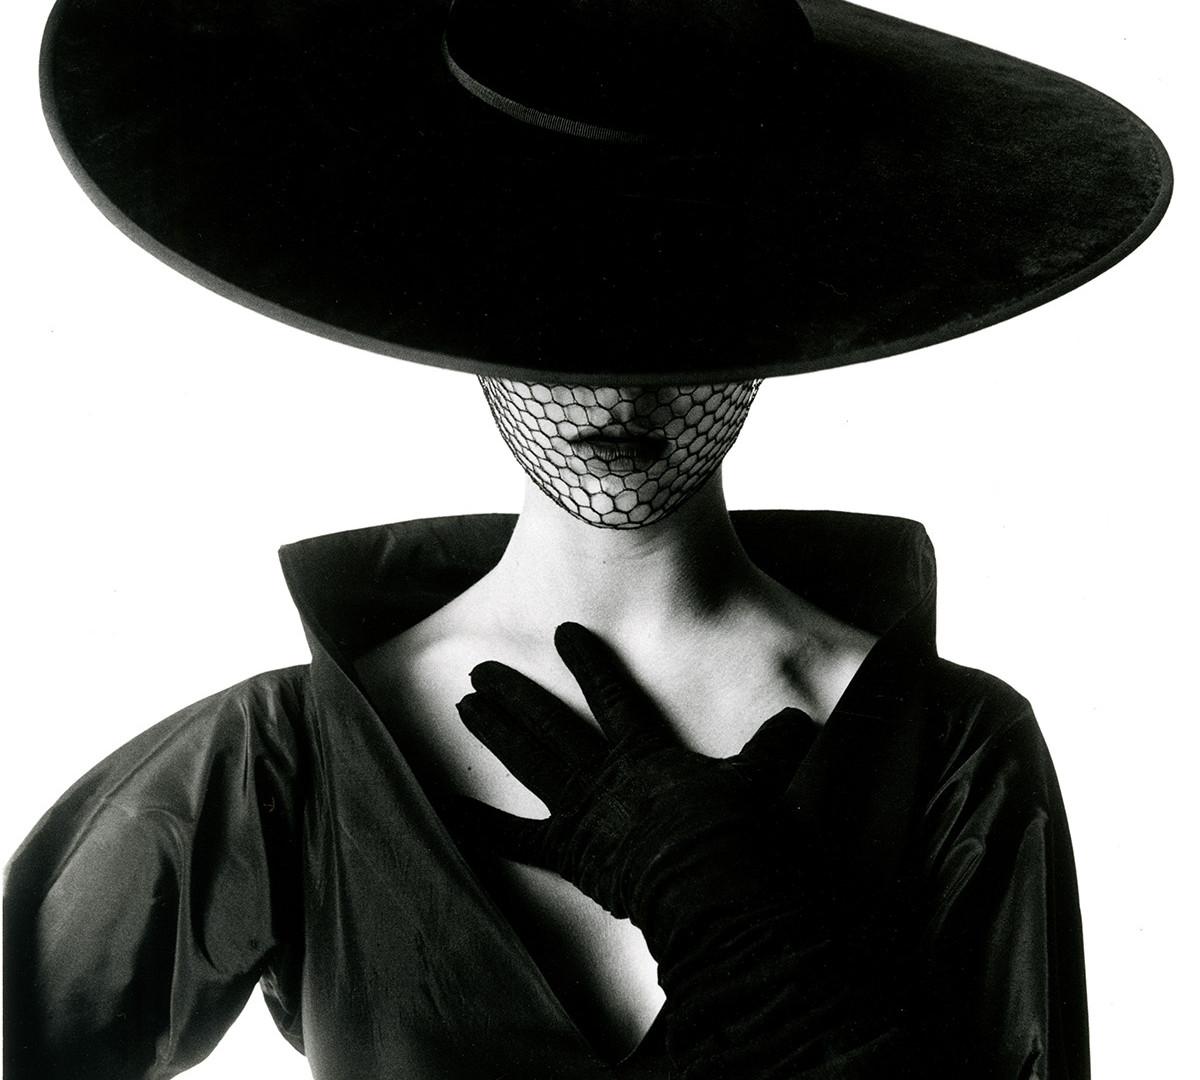 Irving Penn, Fashion Photograph (Jean Patchett) (A), New York, 1949